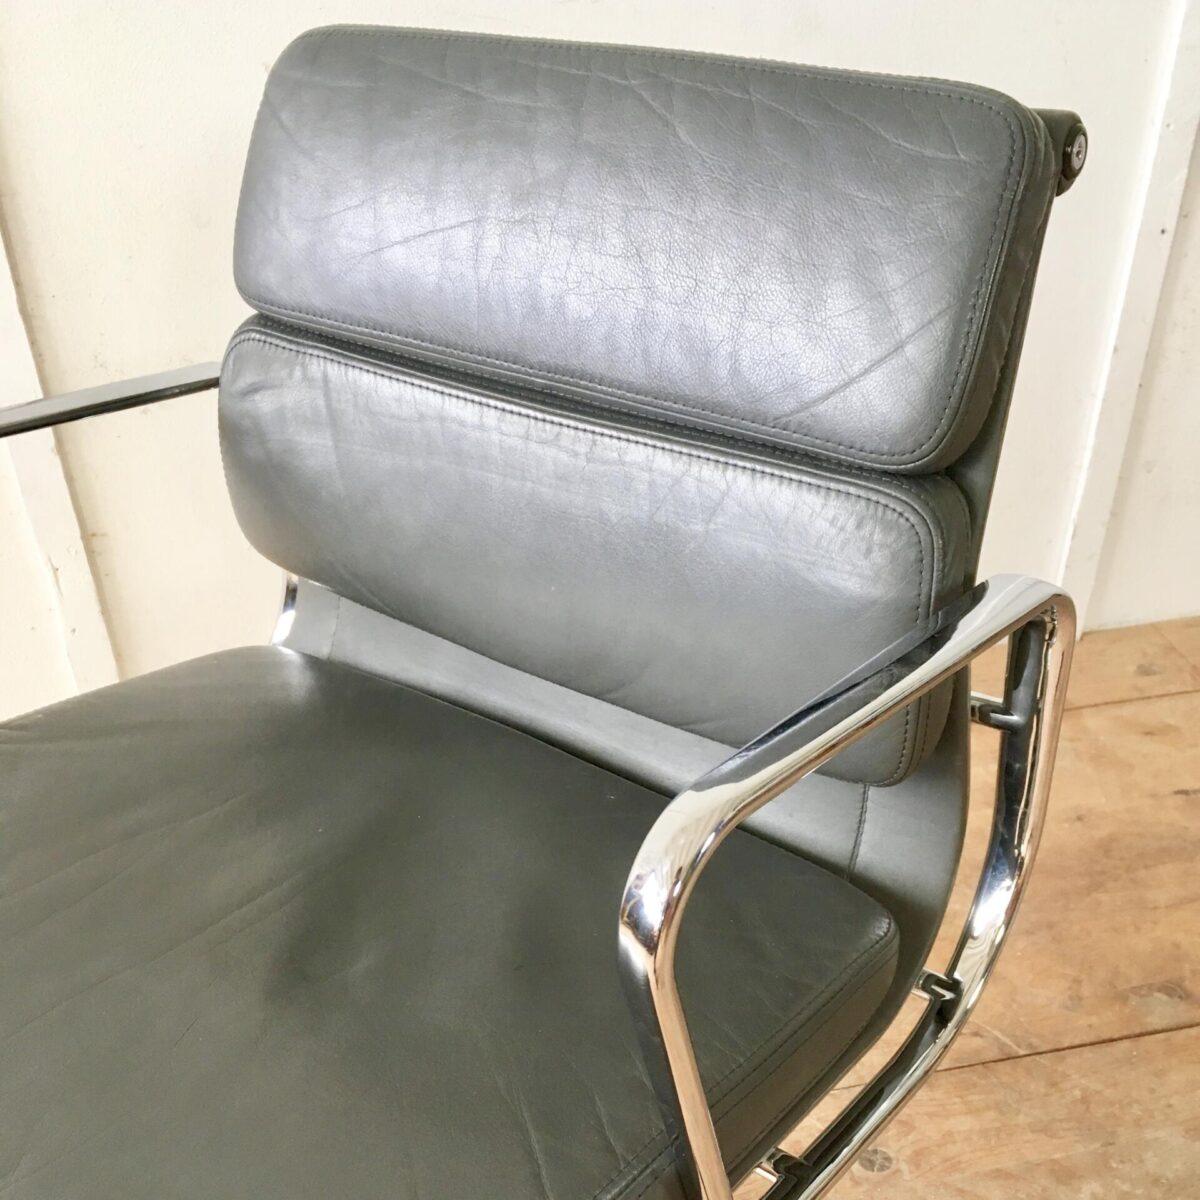 Hermann Miller chair Bürostuhl Drehstuhl. Vitra soft pad ea 208 sitzungsstuhl, Ledersessel grau antrazith.